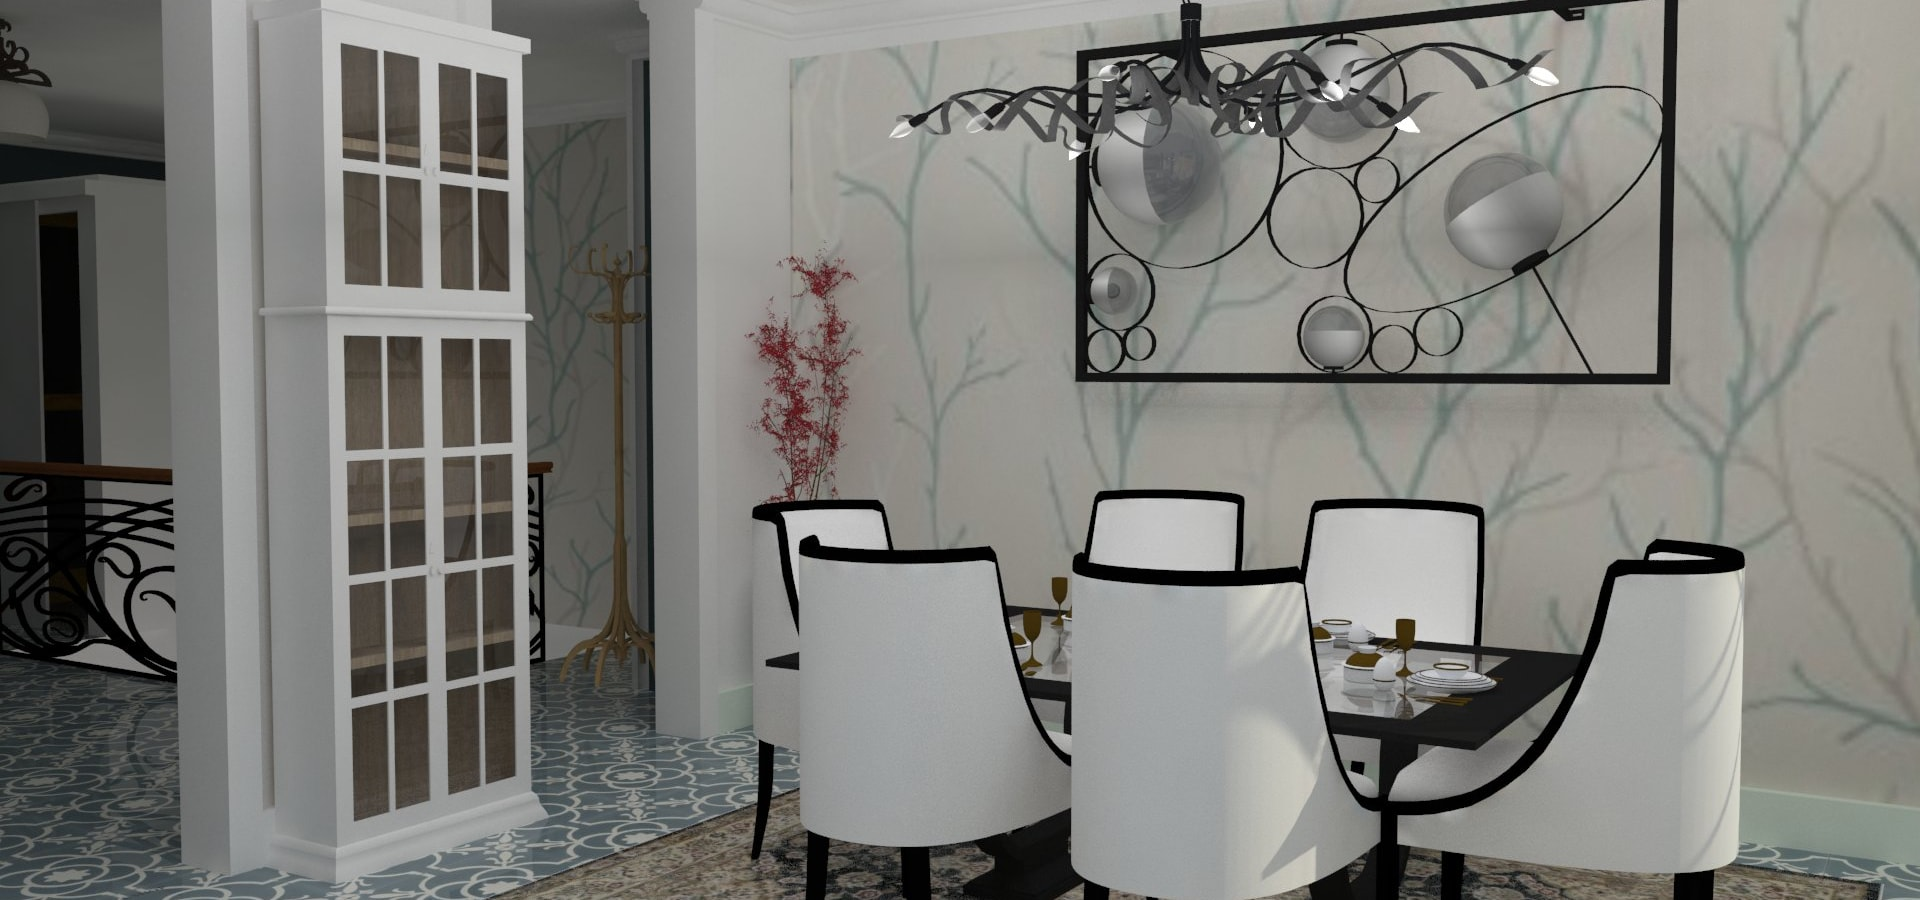 MTD studio and design